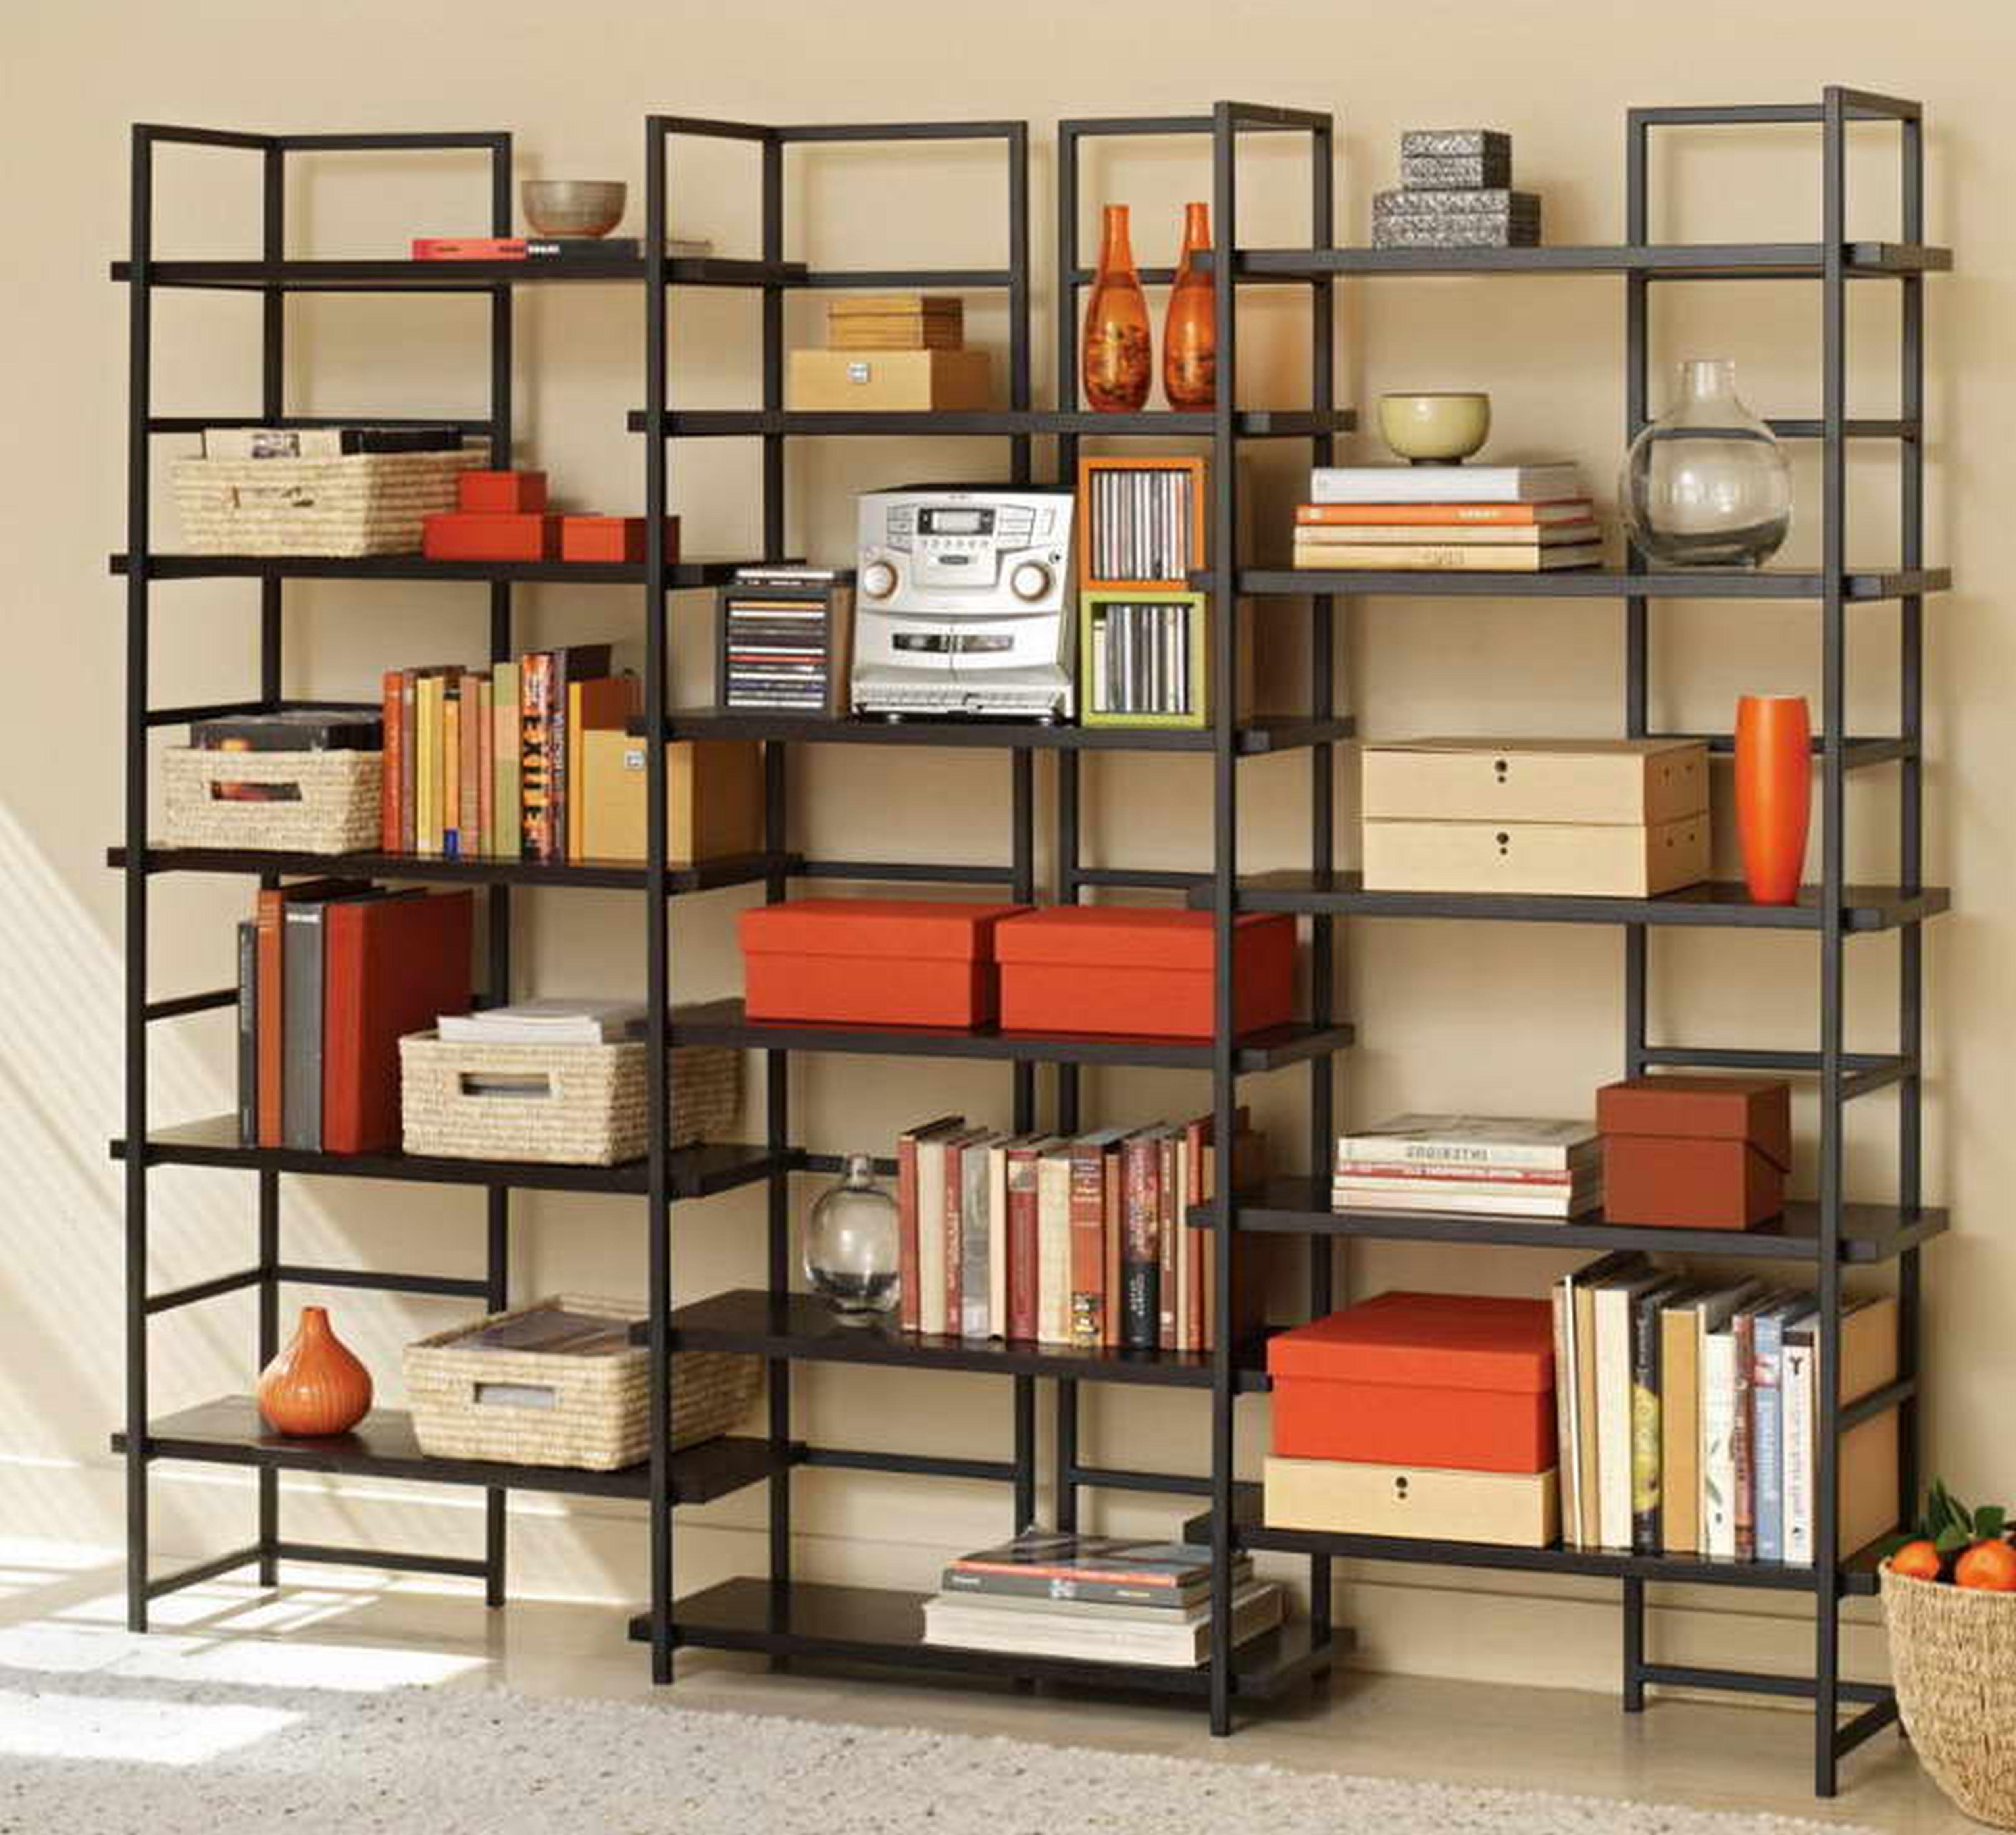 10 awesome diy bookcase ideas diy bookcases modern for Diy modern bookshelf